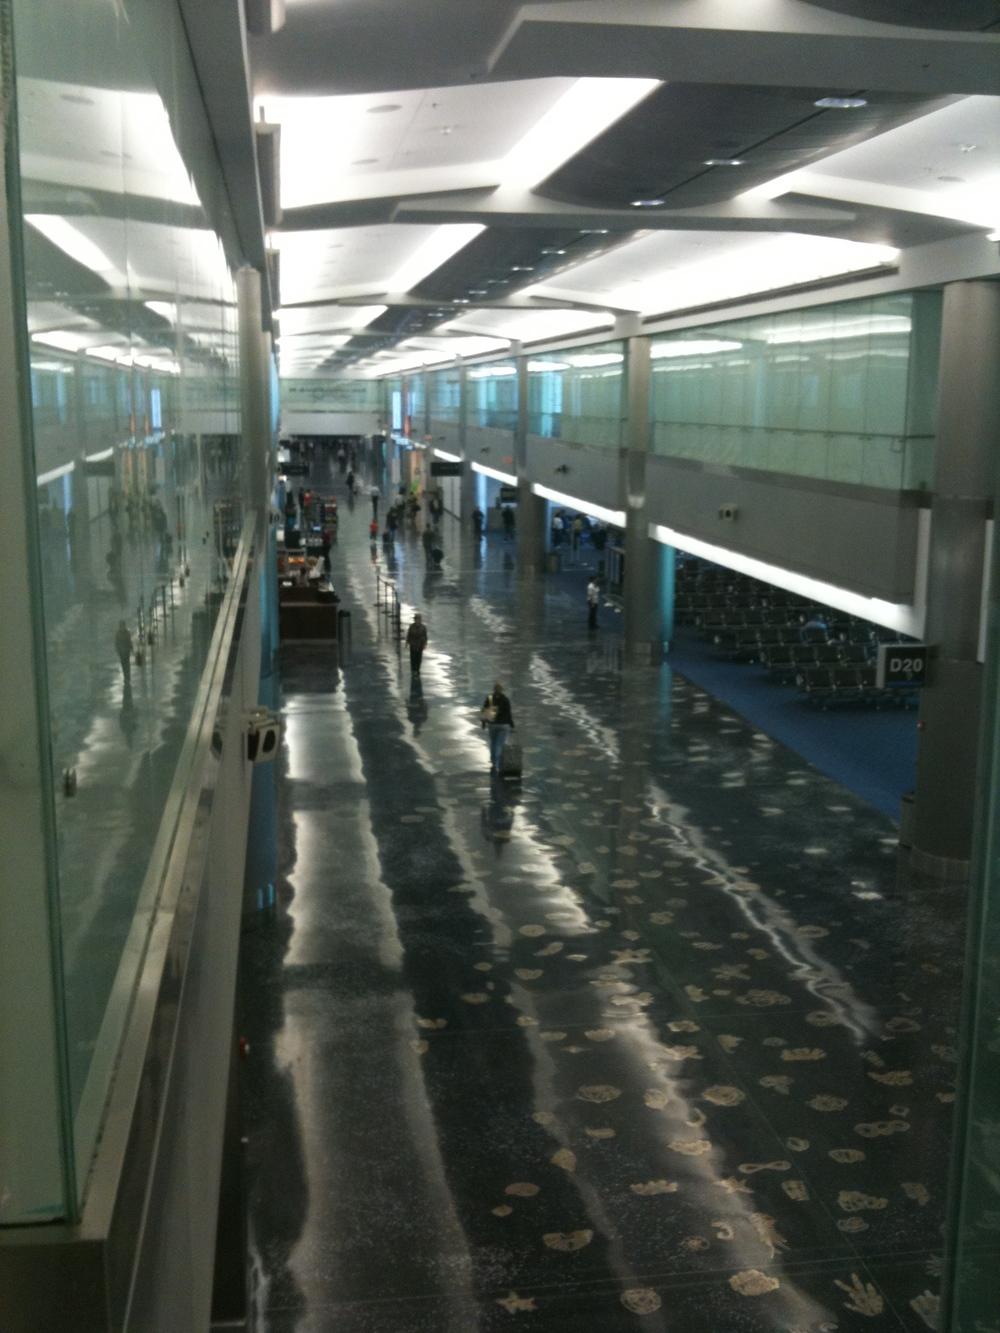 Copy of Miami International airport - North Terminal development A-B Infill*